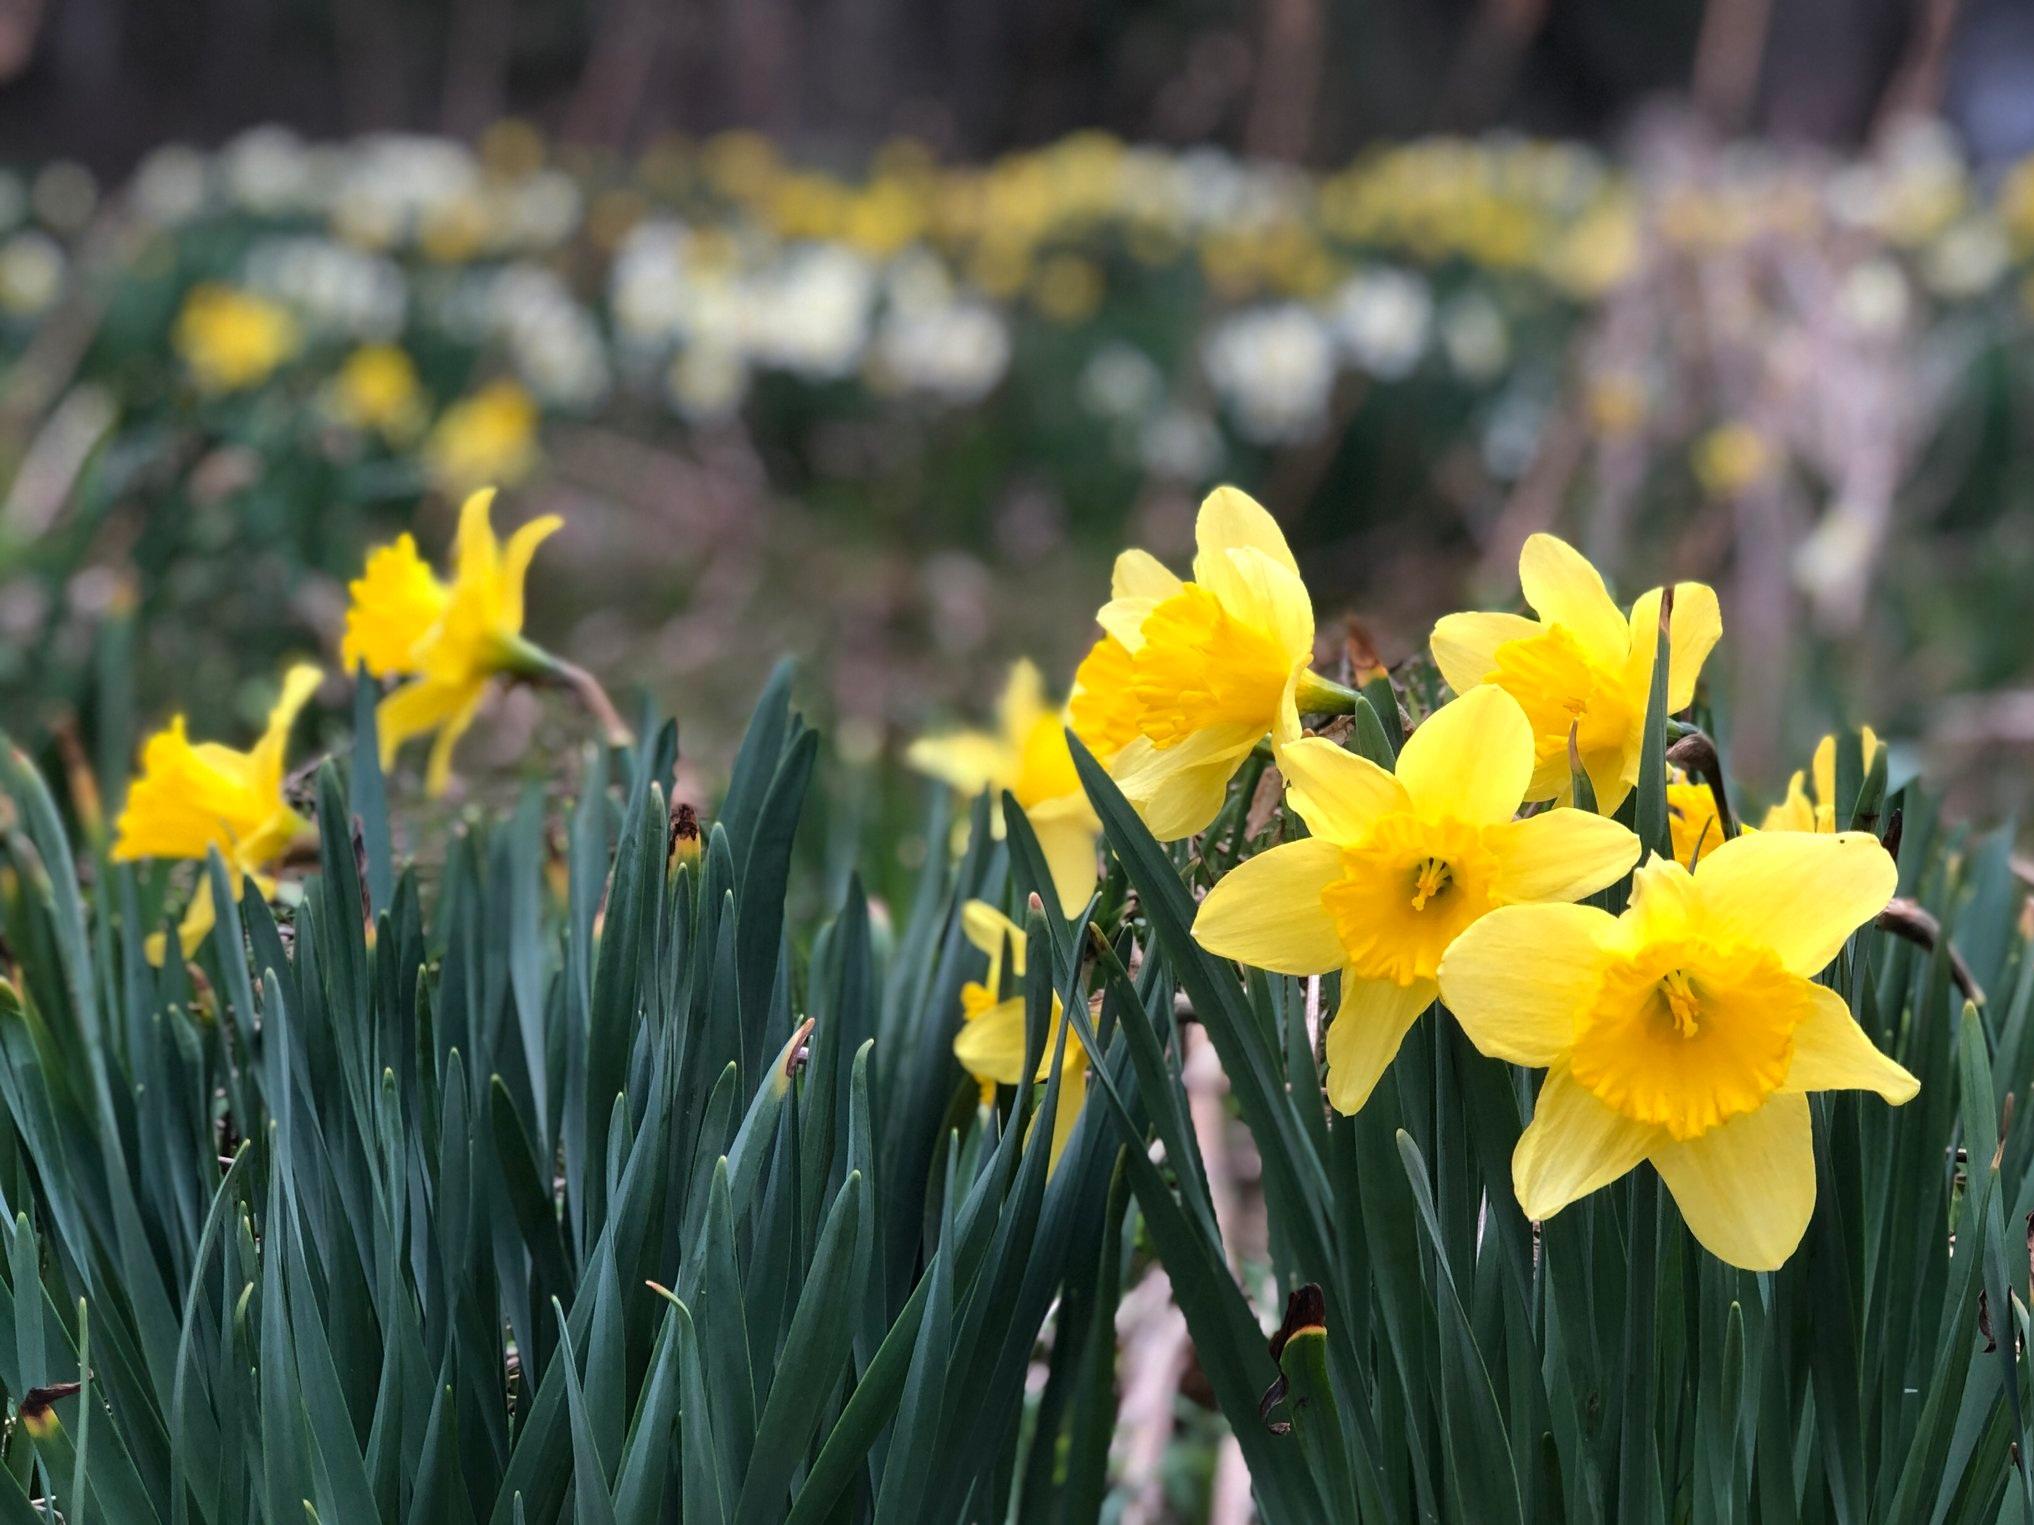 Daffodils at davistudio, April 2019